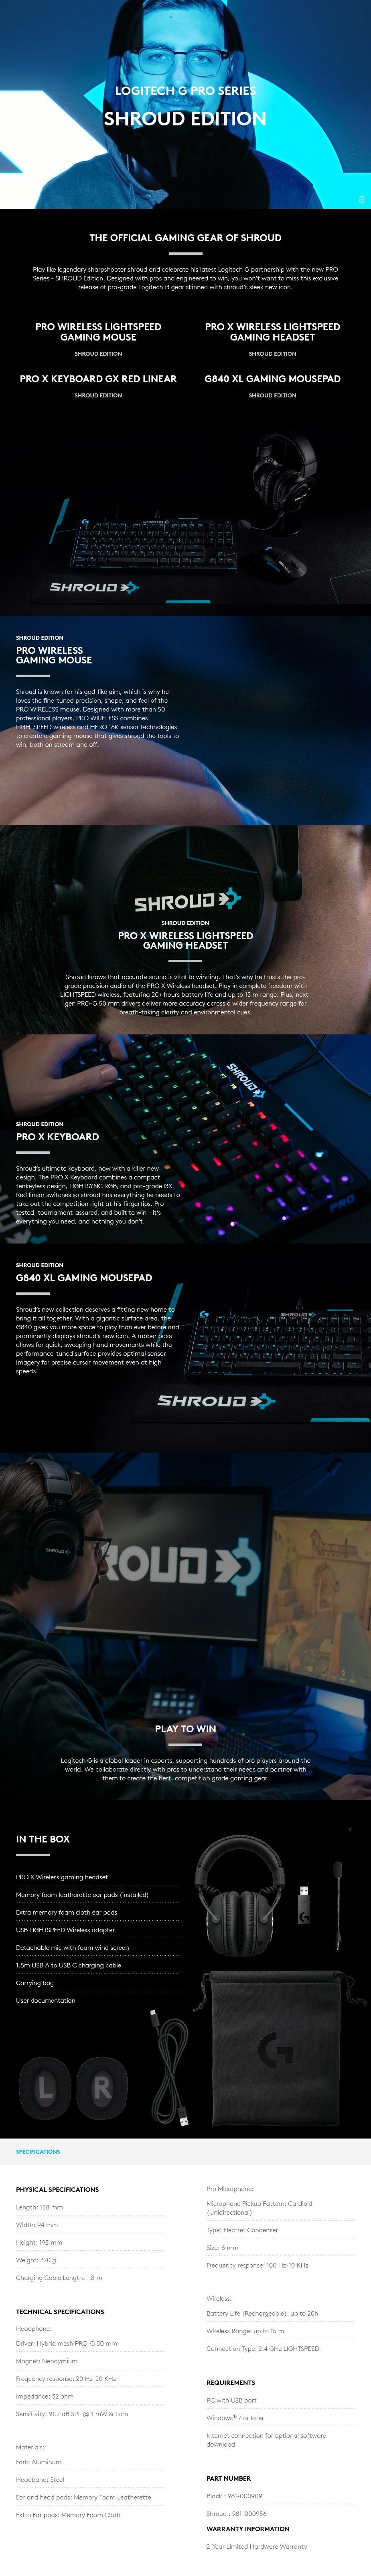 logitech-g-pro-x-lightspeed-wireless-gaming-headset-shroud-edition-ac43209-1.jpg